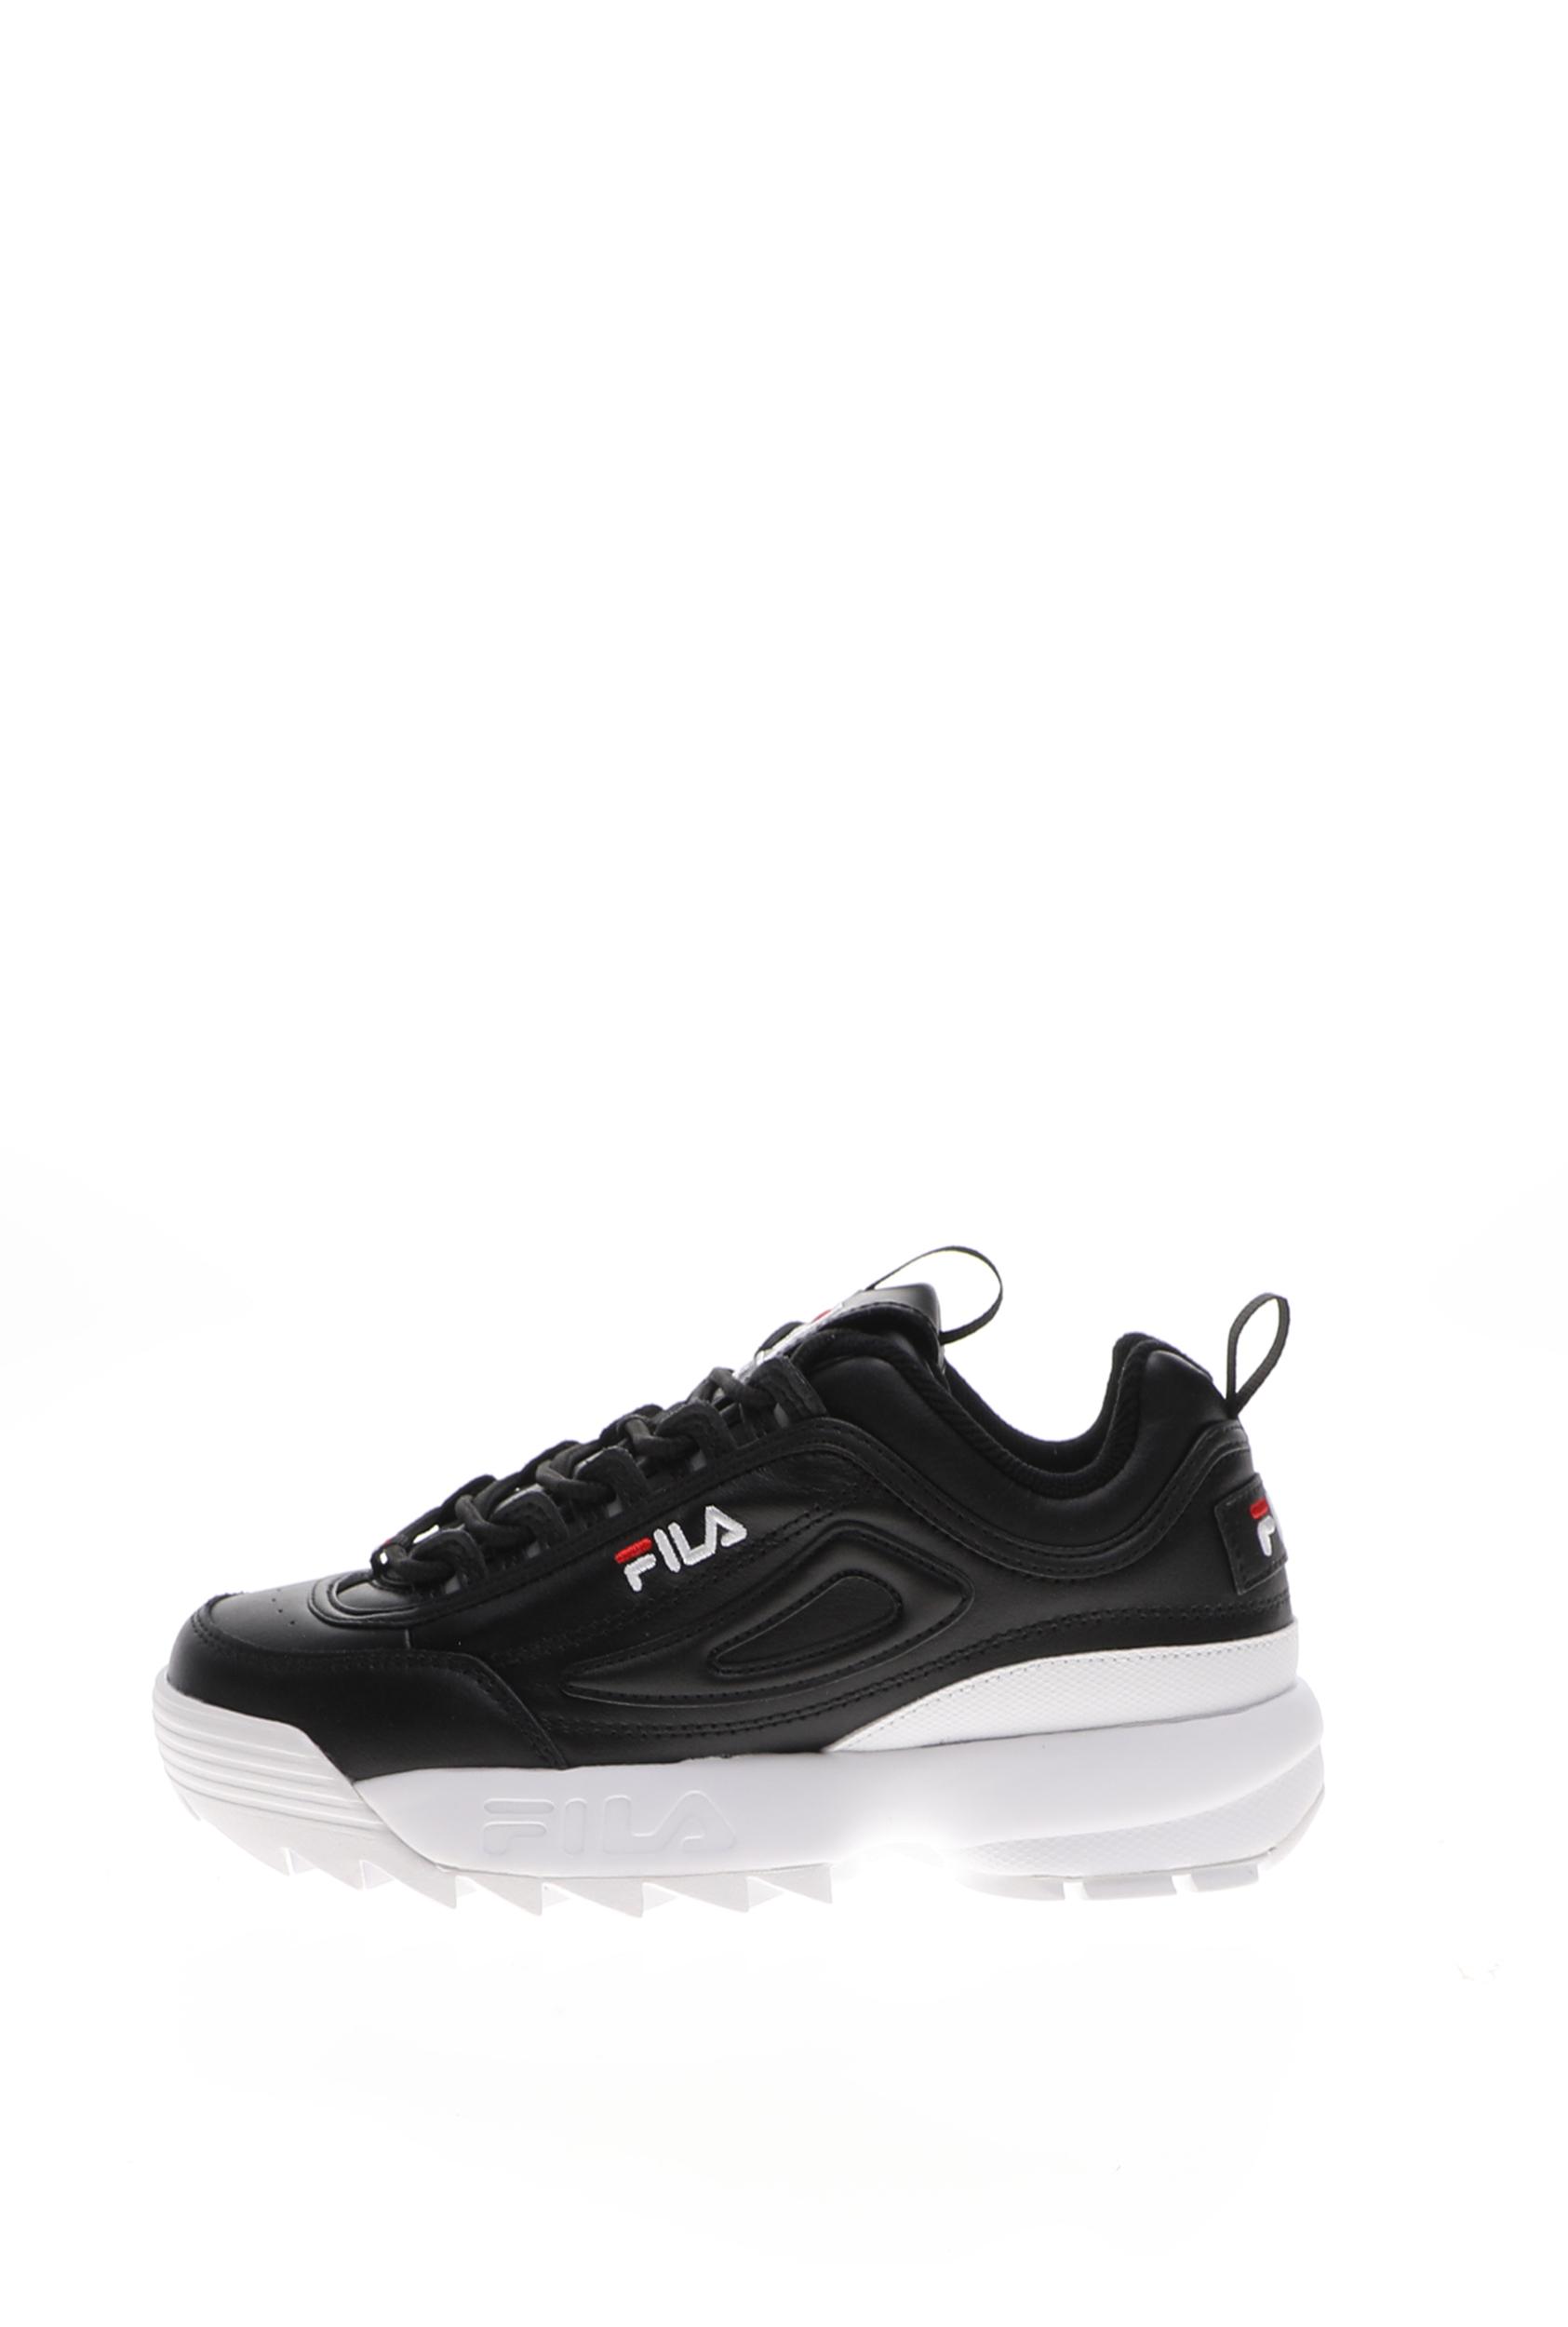 FILA – Γυναικεία sneakers FILA DISRUPTOR II PREMIUM μαύρα